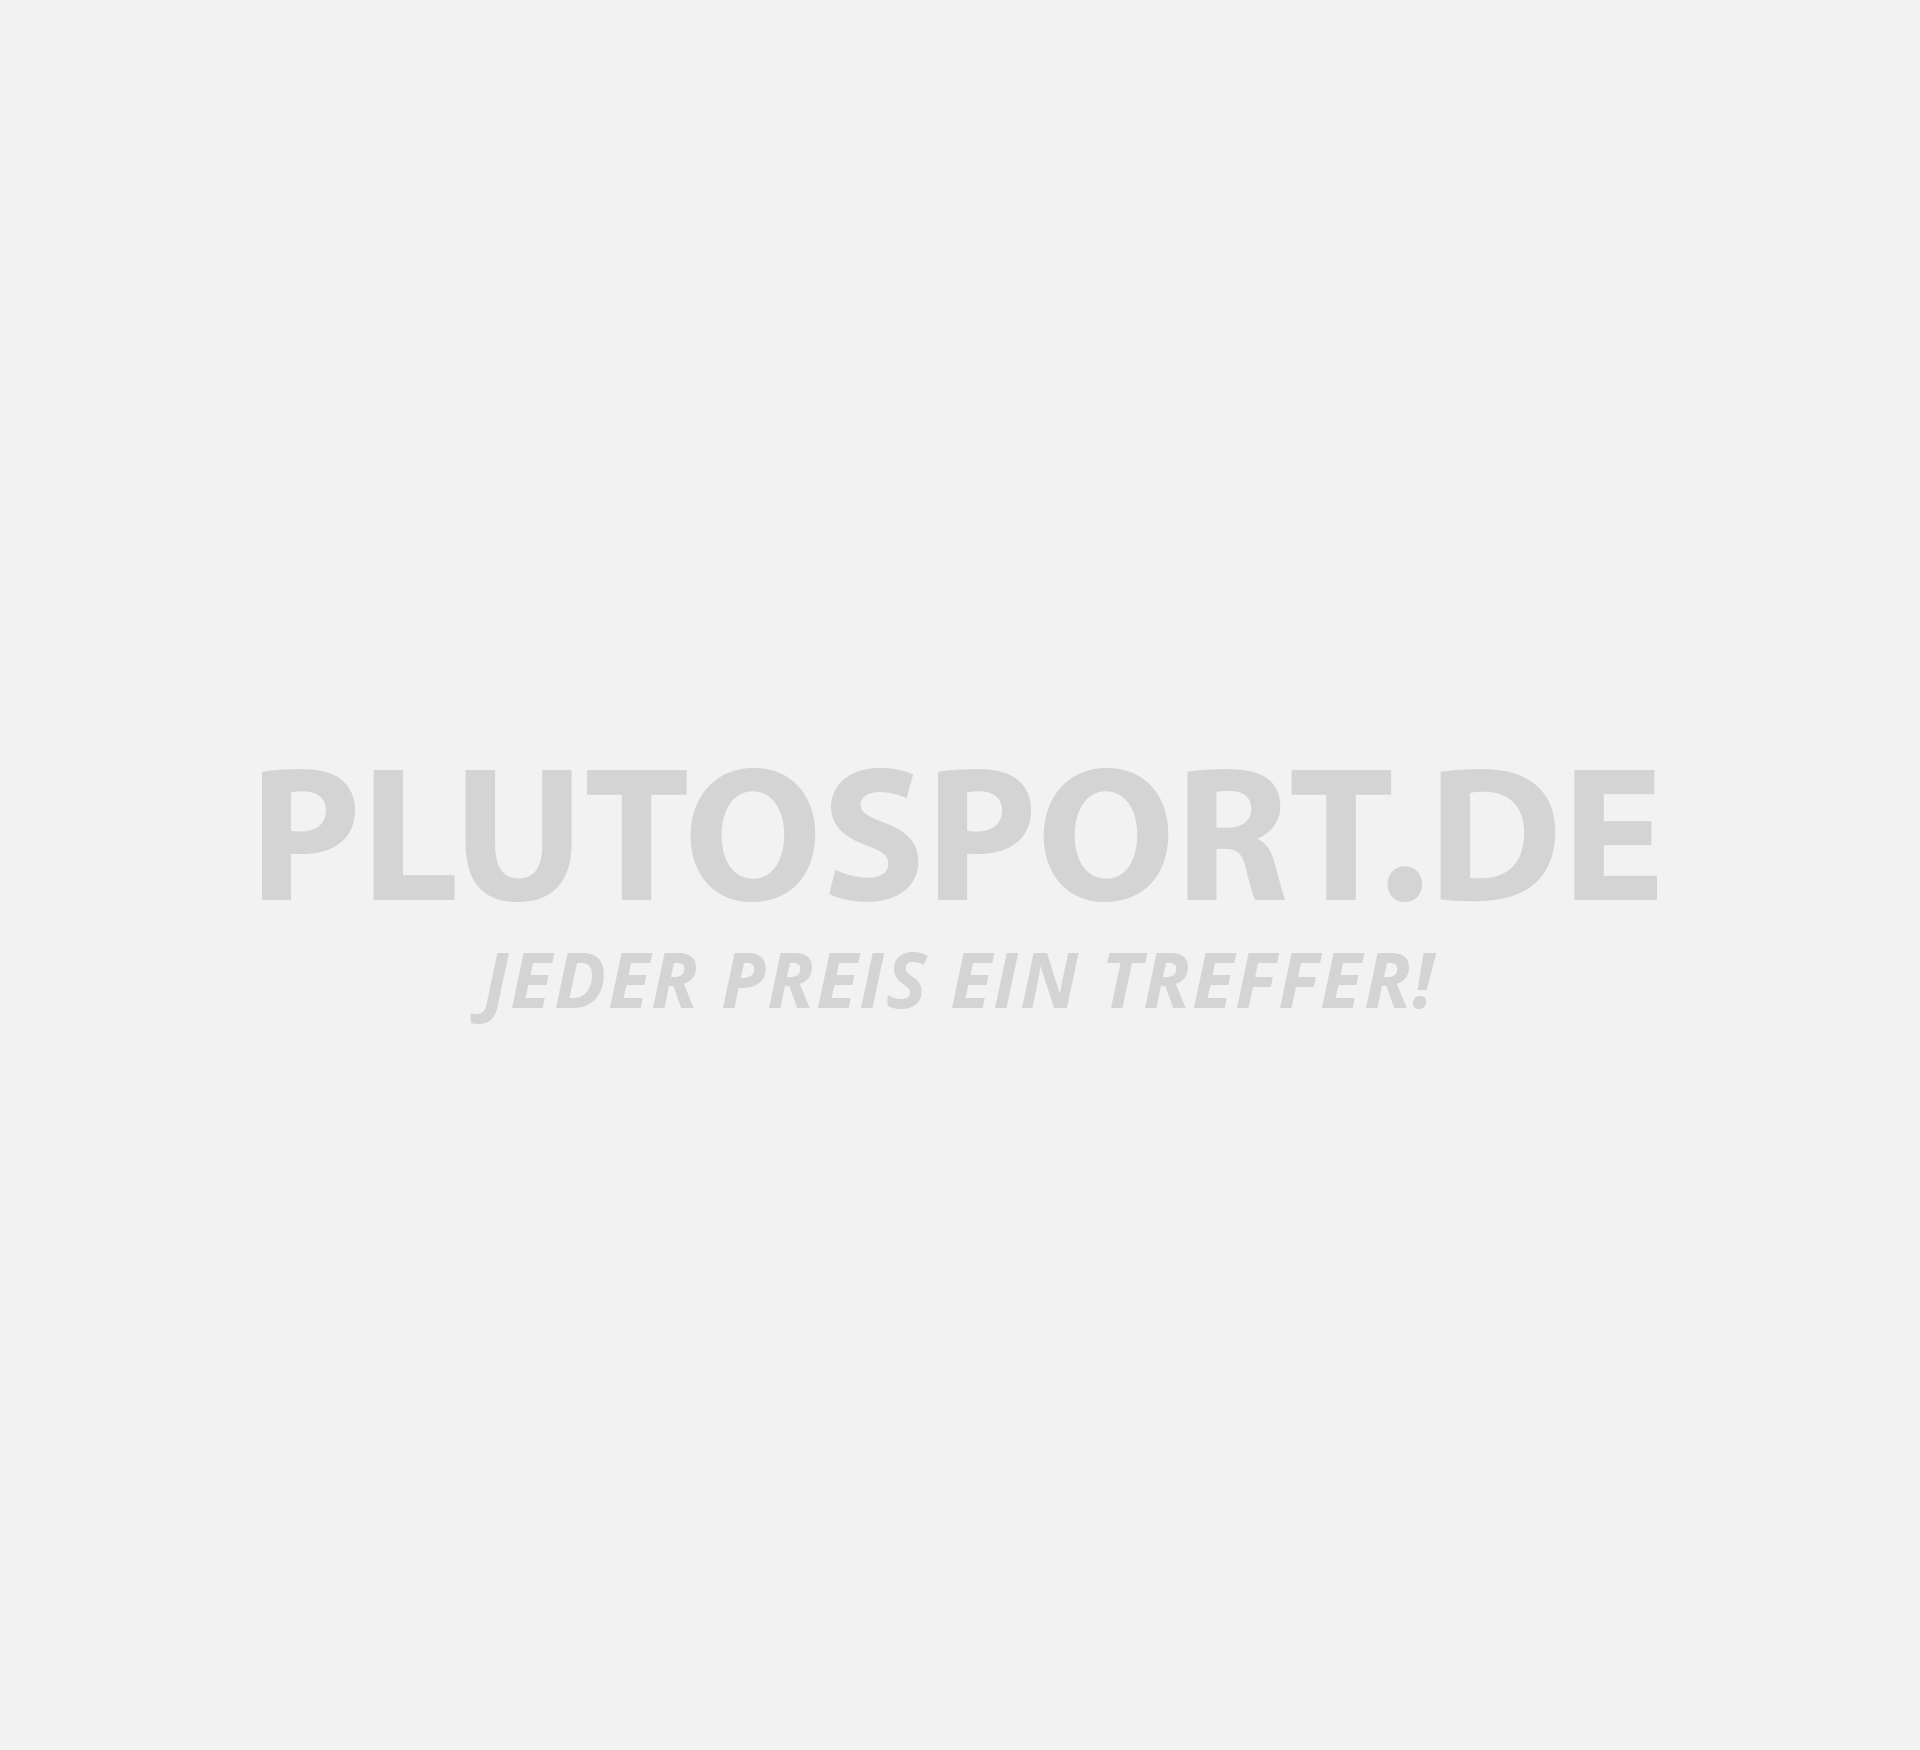 Sneakers Freizeit 10k Schuhe TKcF5l3u1J Adidas Sportarten Casual oeCrdxB